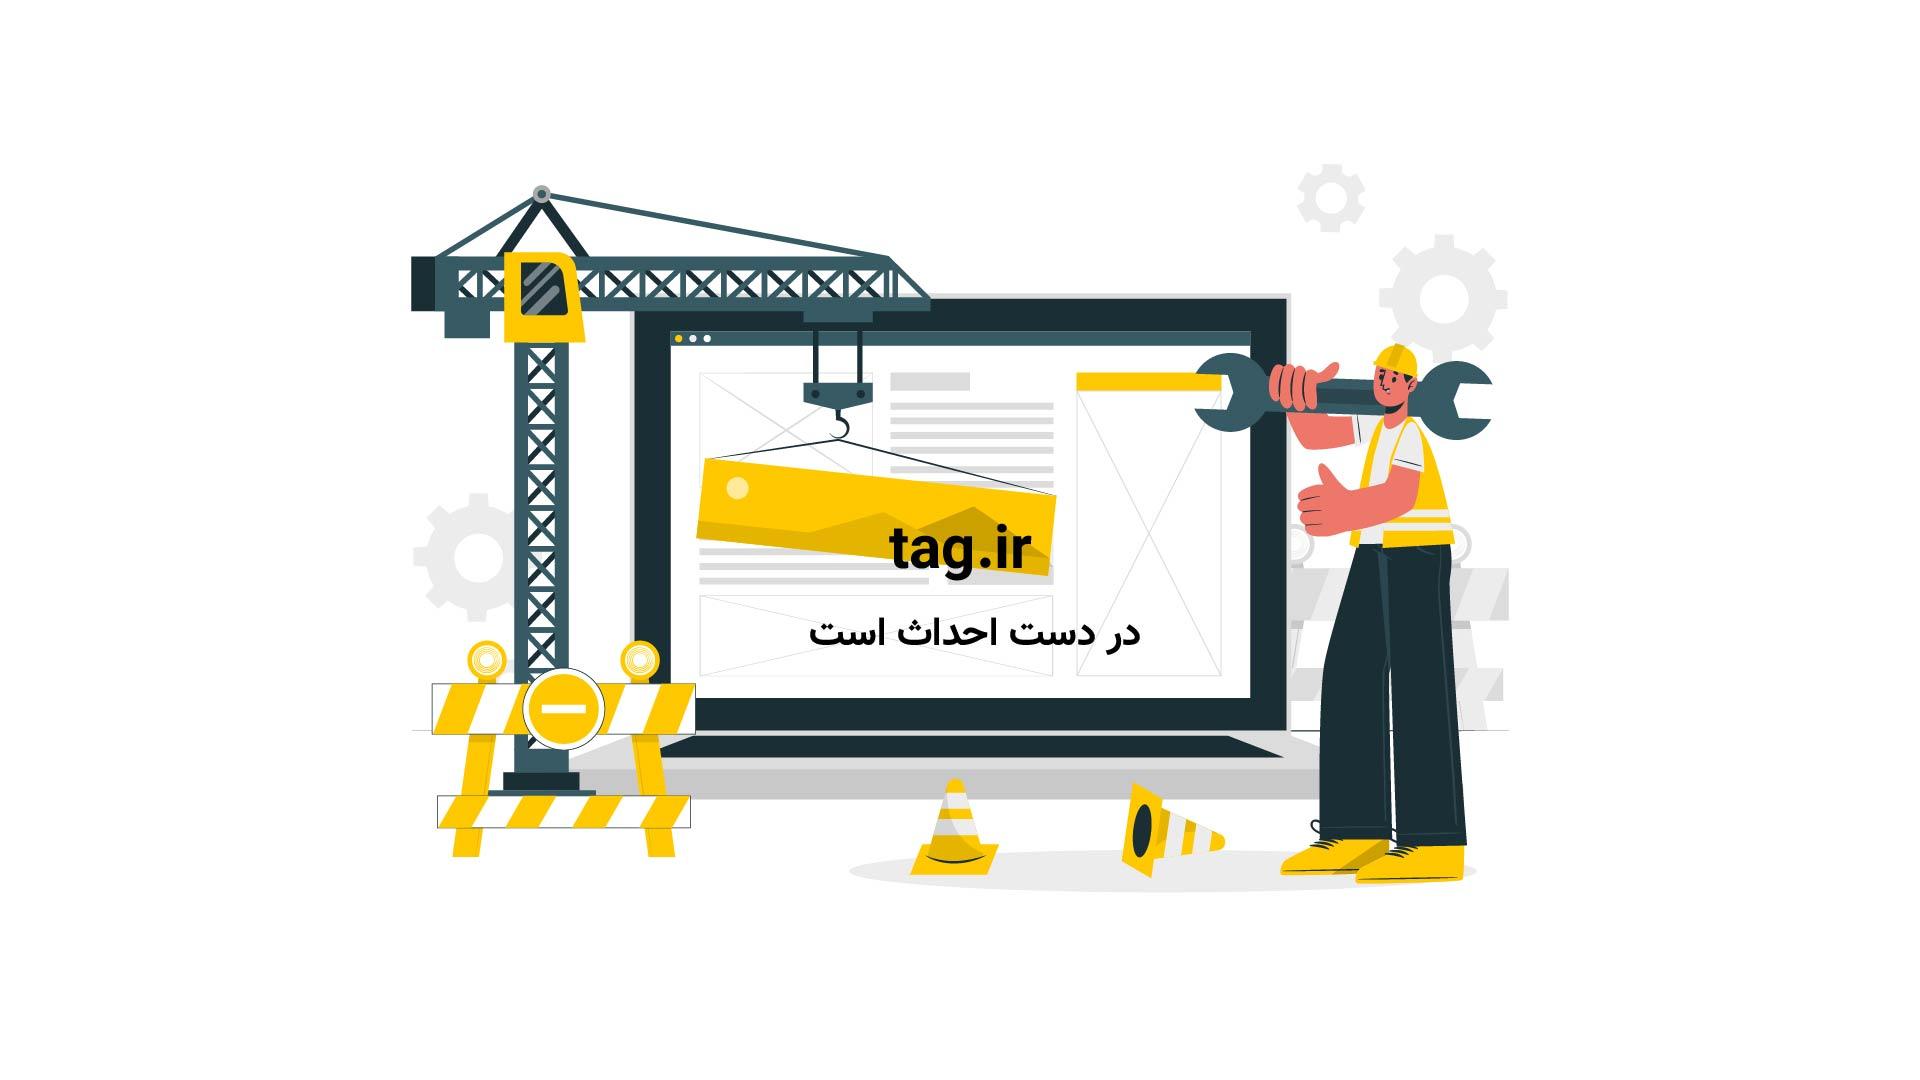 مقابله چیتا و پلنگ بر سر لاشه شکار | فیلم